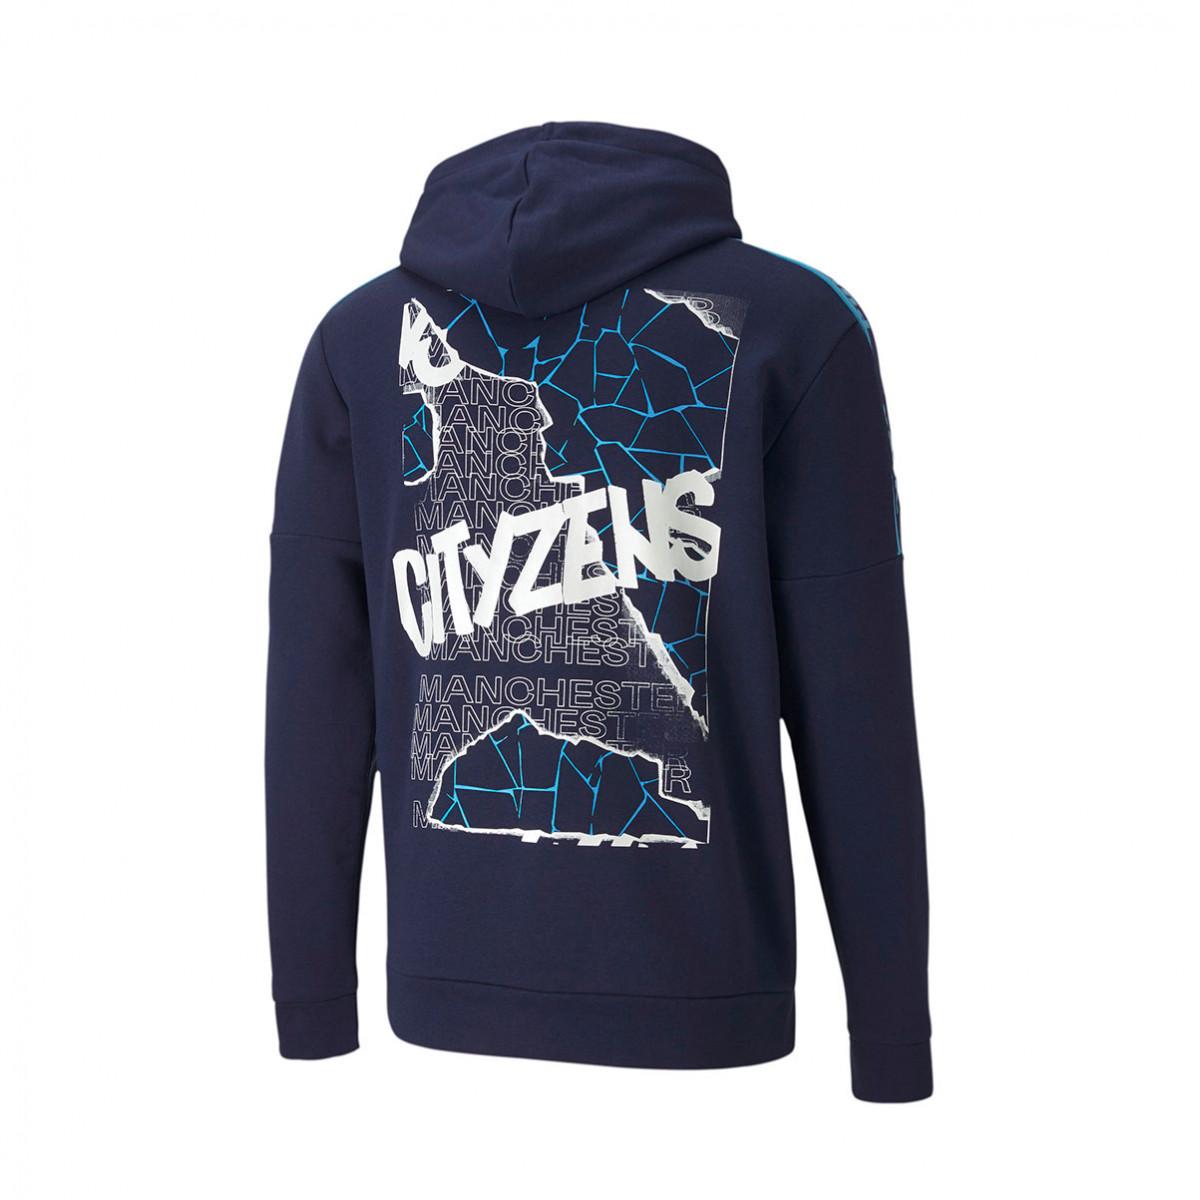 Sweatshirt Puma Manchester City Fc Ftblculture Hoody 2020 2021 Peacoat Team Light Blue Futbol Emotion